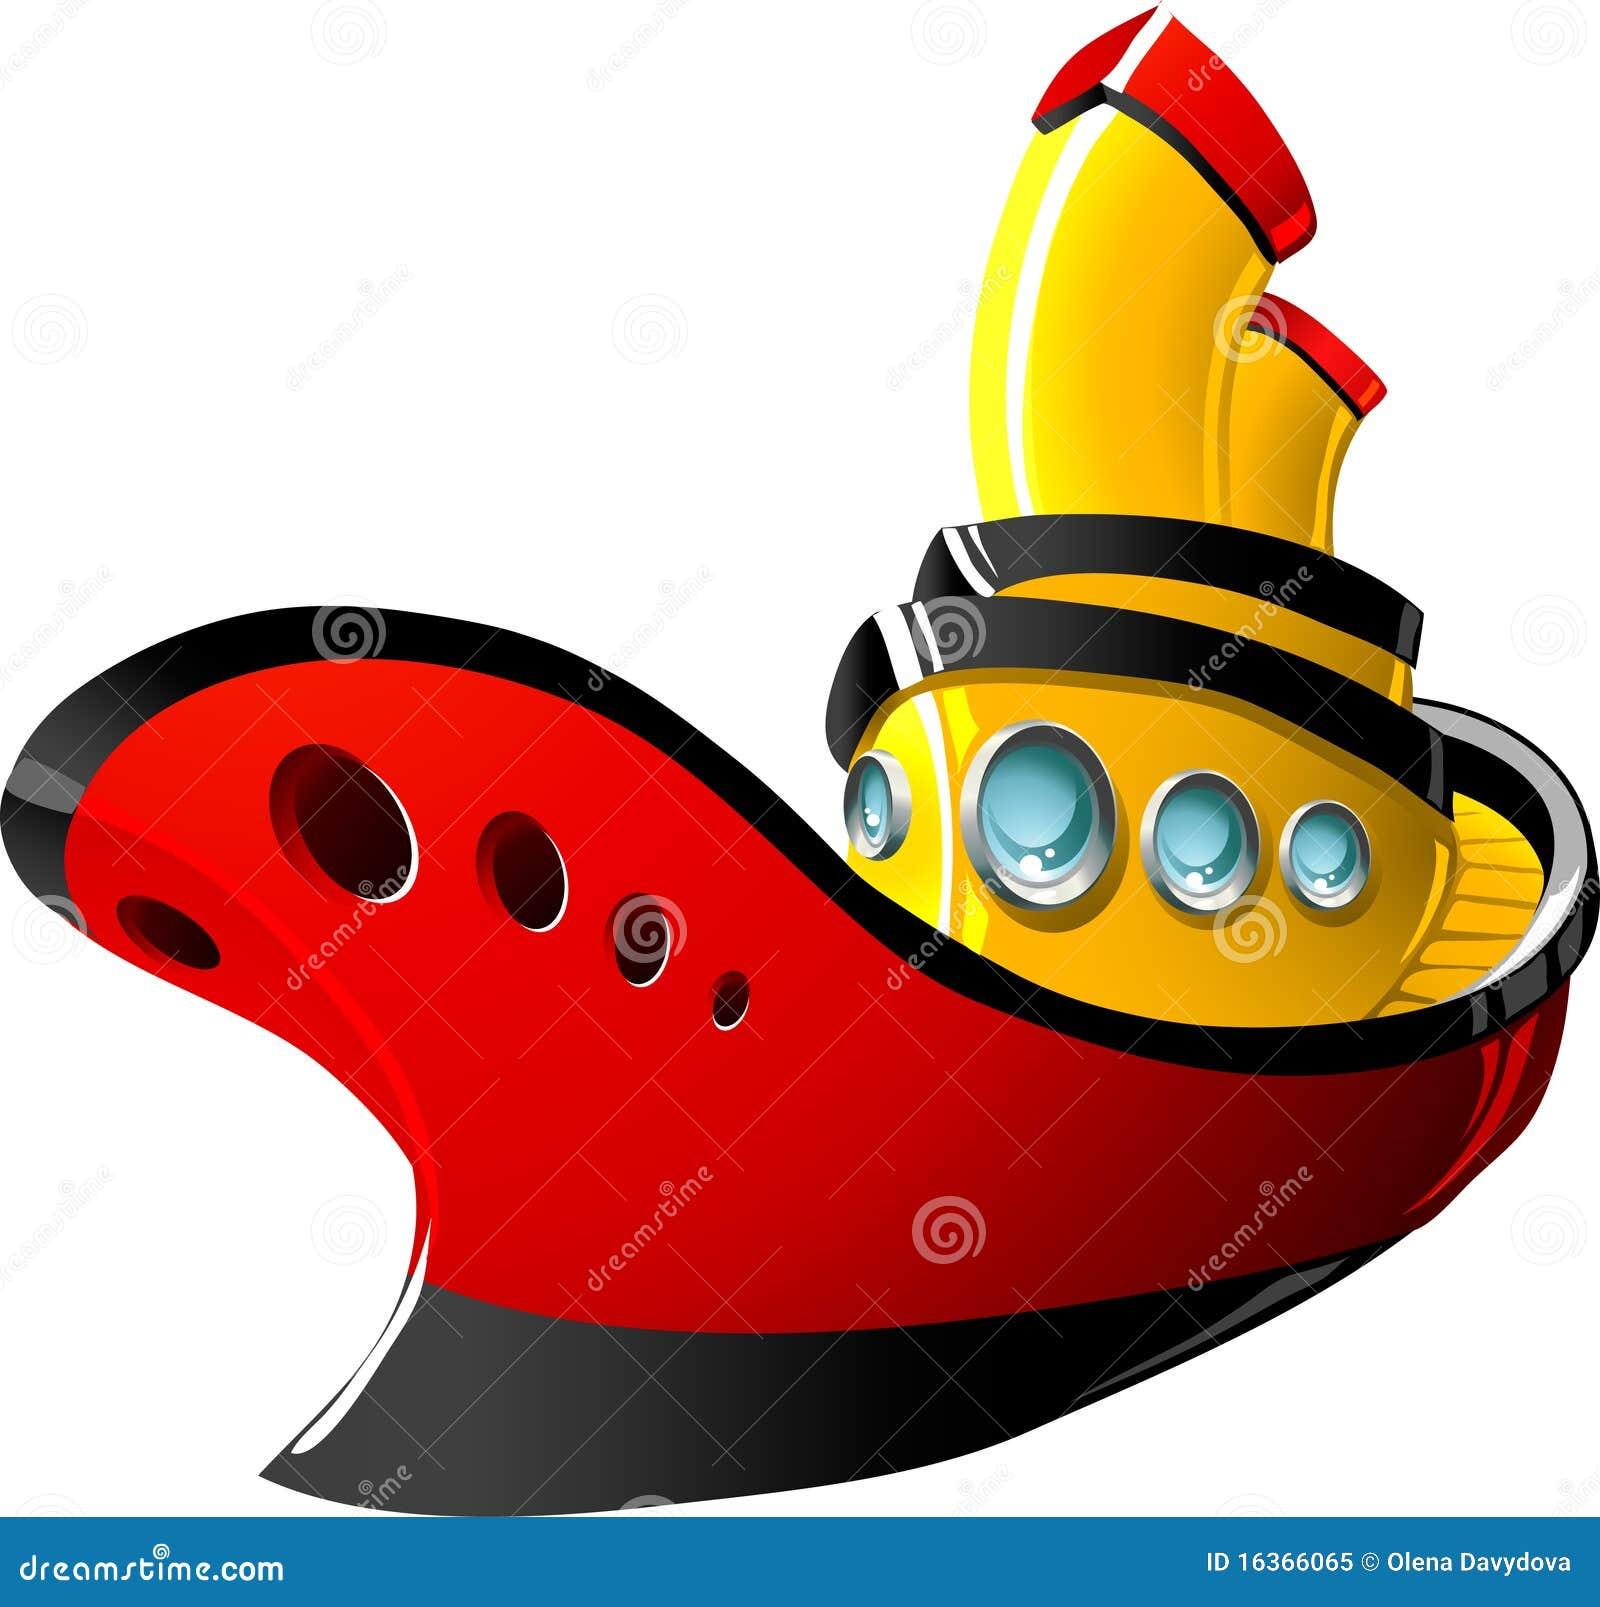 Cartoon Tugboat Royalty Free Stock Photo - Image: 16366065